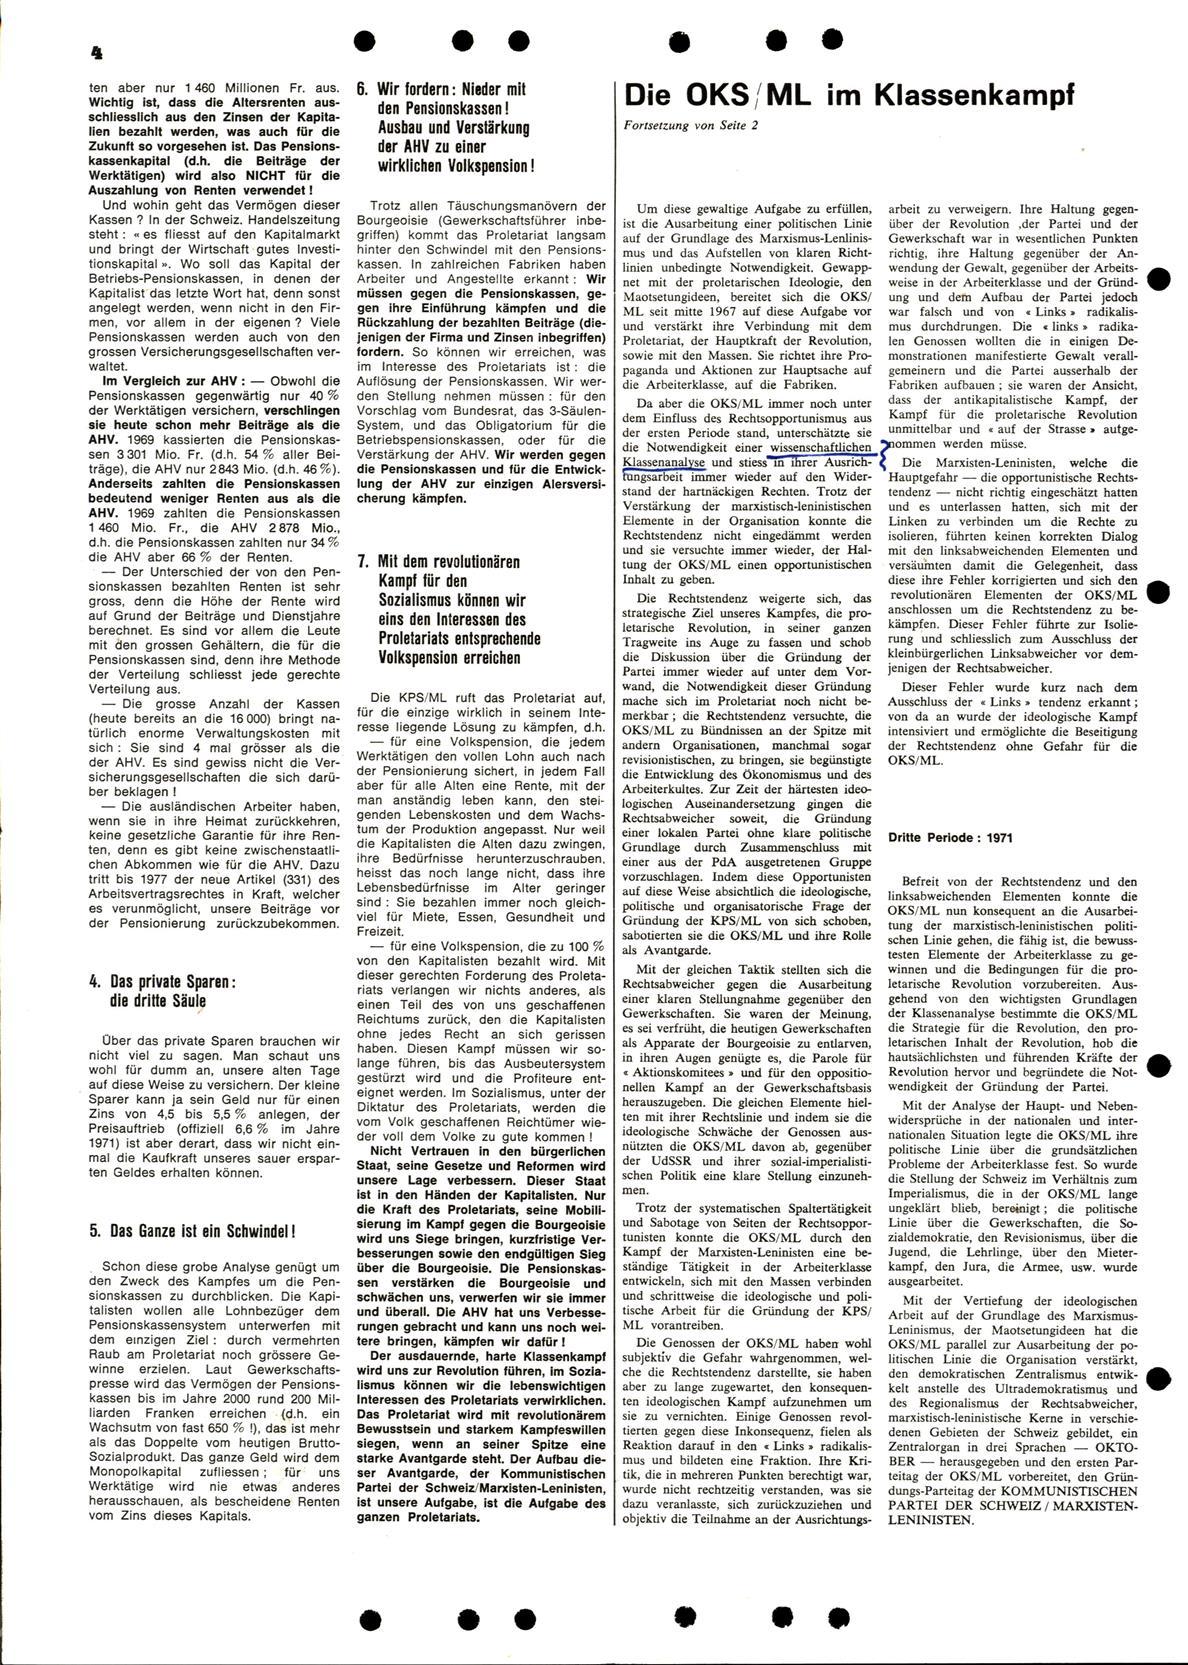 Schweiz_KPSML_Oktober_19720300_048_004